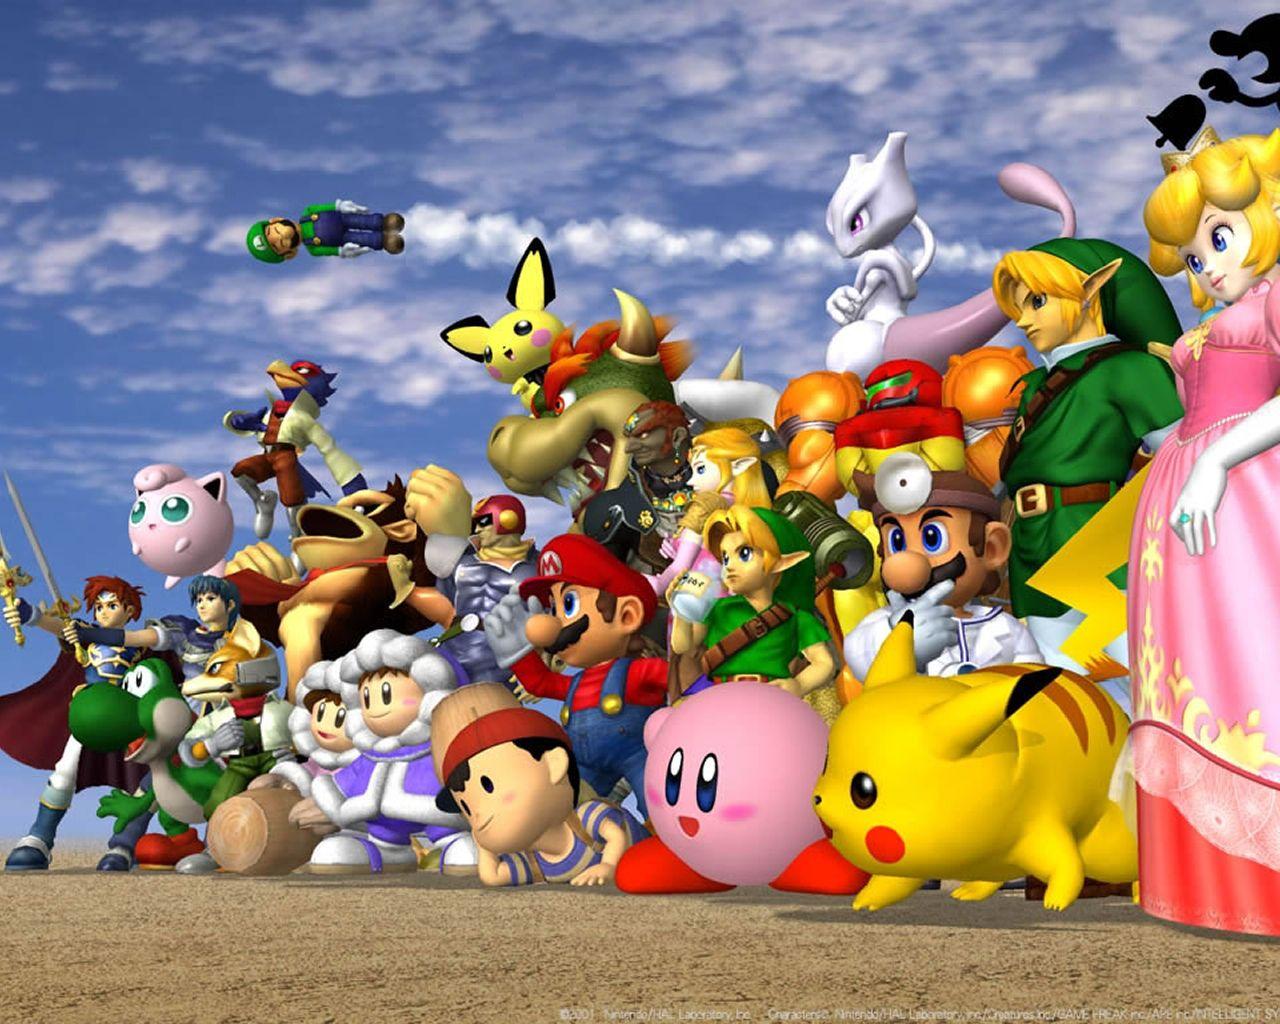 Top Wallpaper Logo Super Smash Bro - b27bade41c874e070b347a36a7bfbec8  Picture_891298.jpg